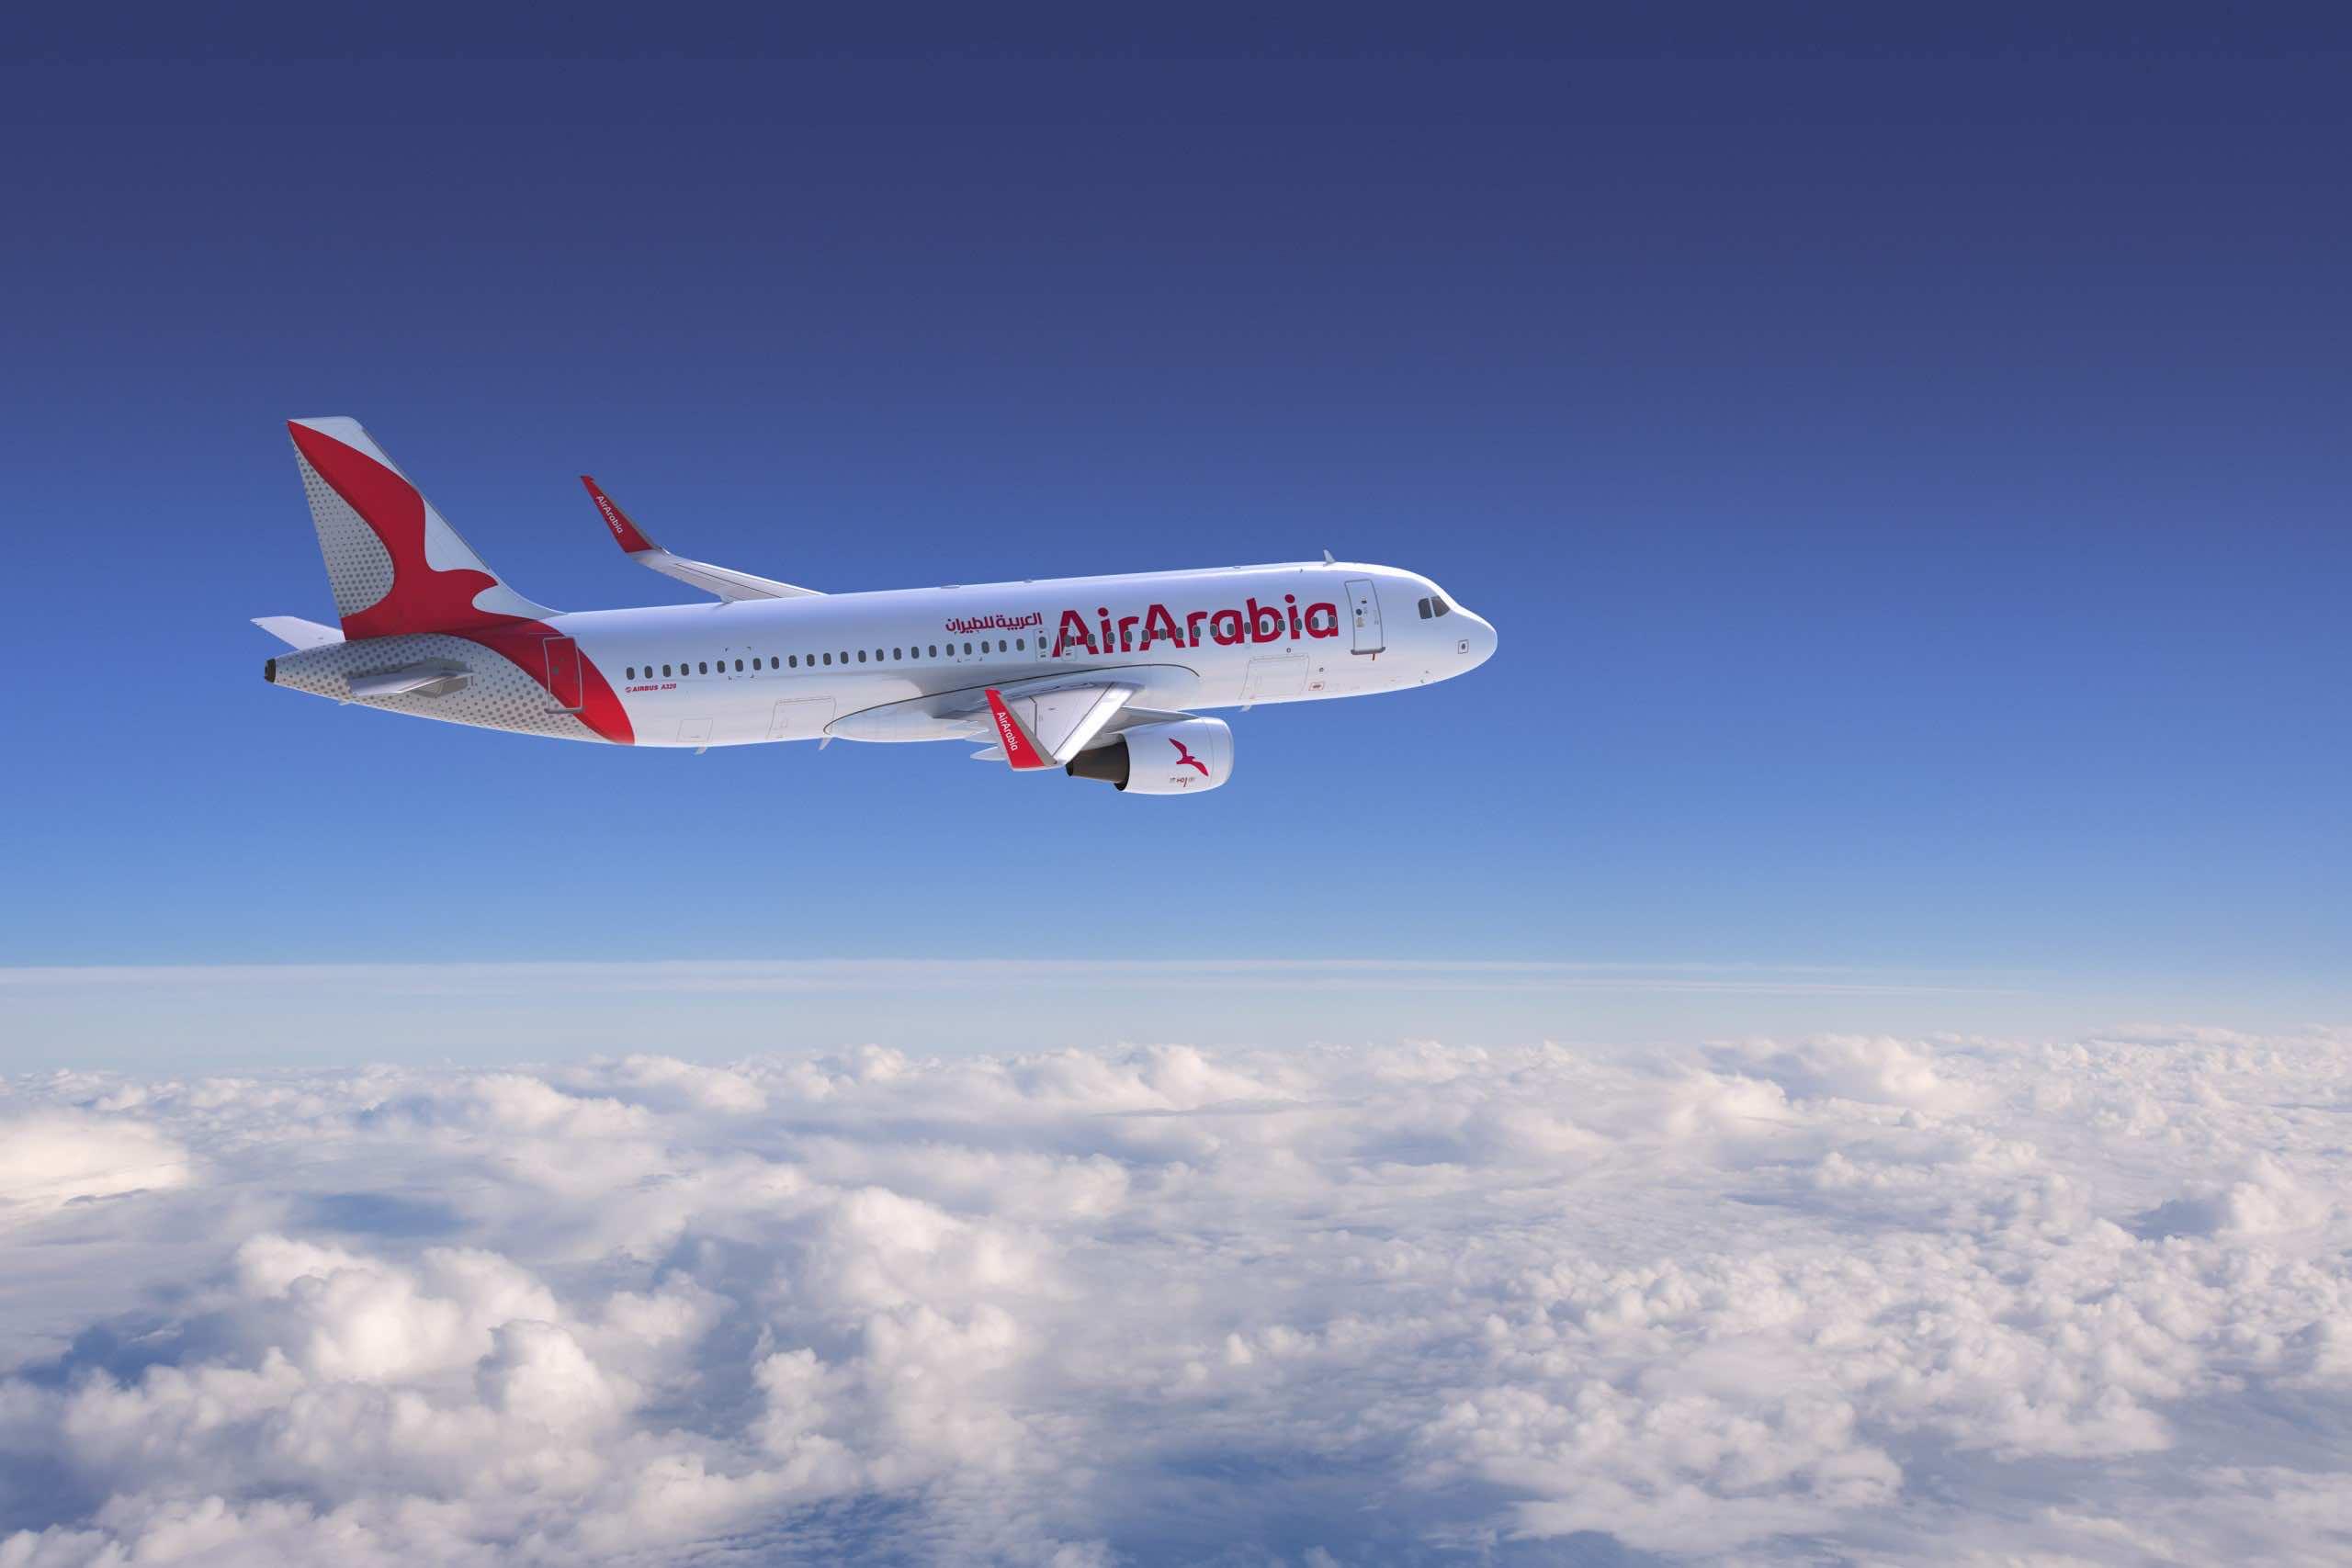 Air Arabia Maroc Launches New Flight Connecting Casablanca, Malaga